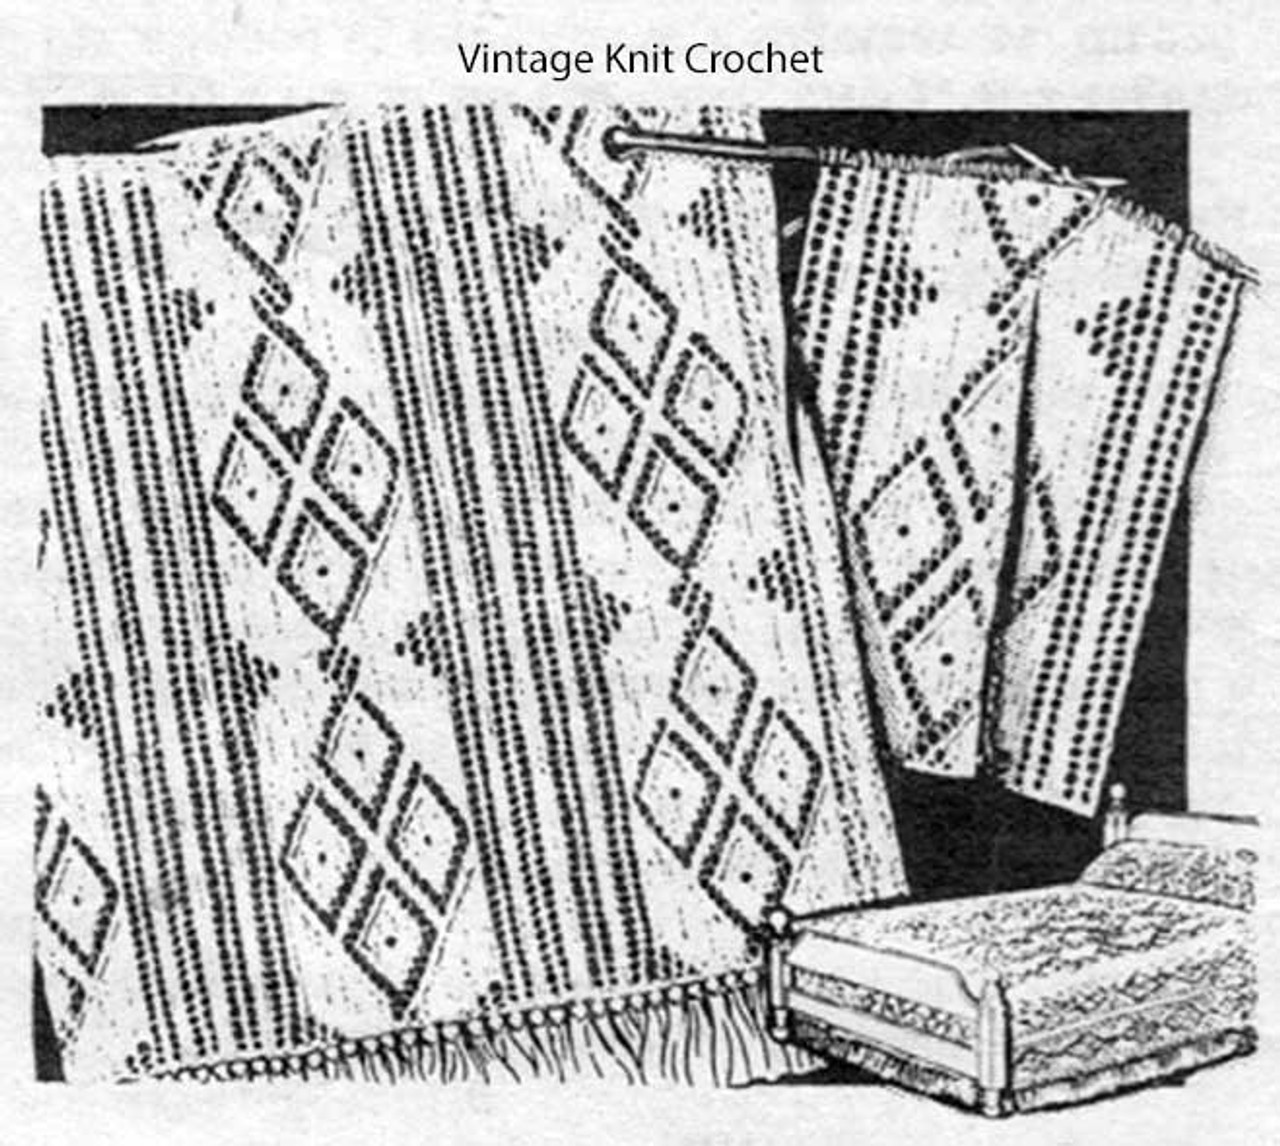 Diamond Bedspread Knitting Pattern Design 7050